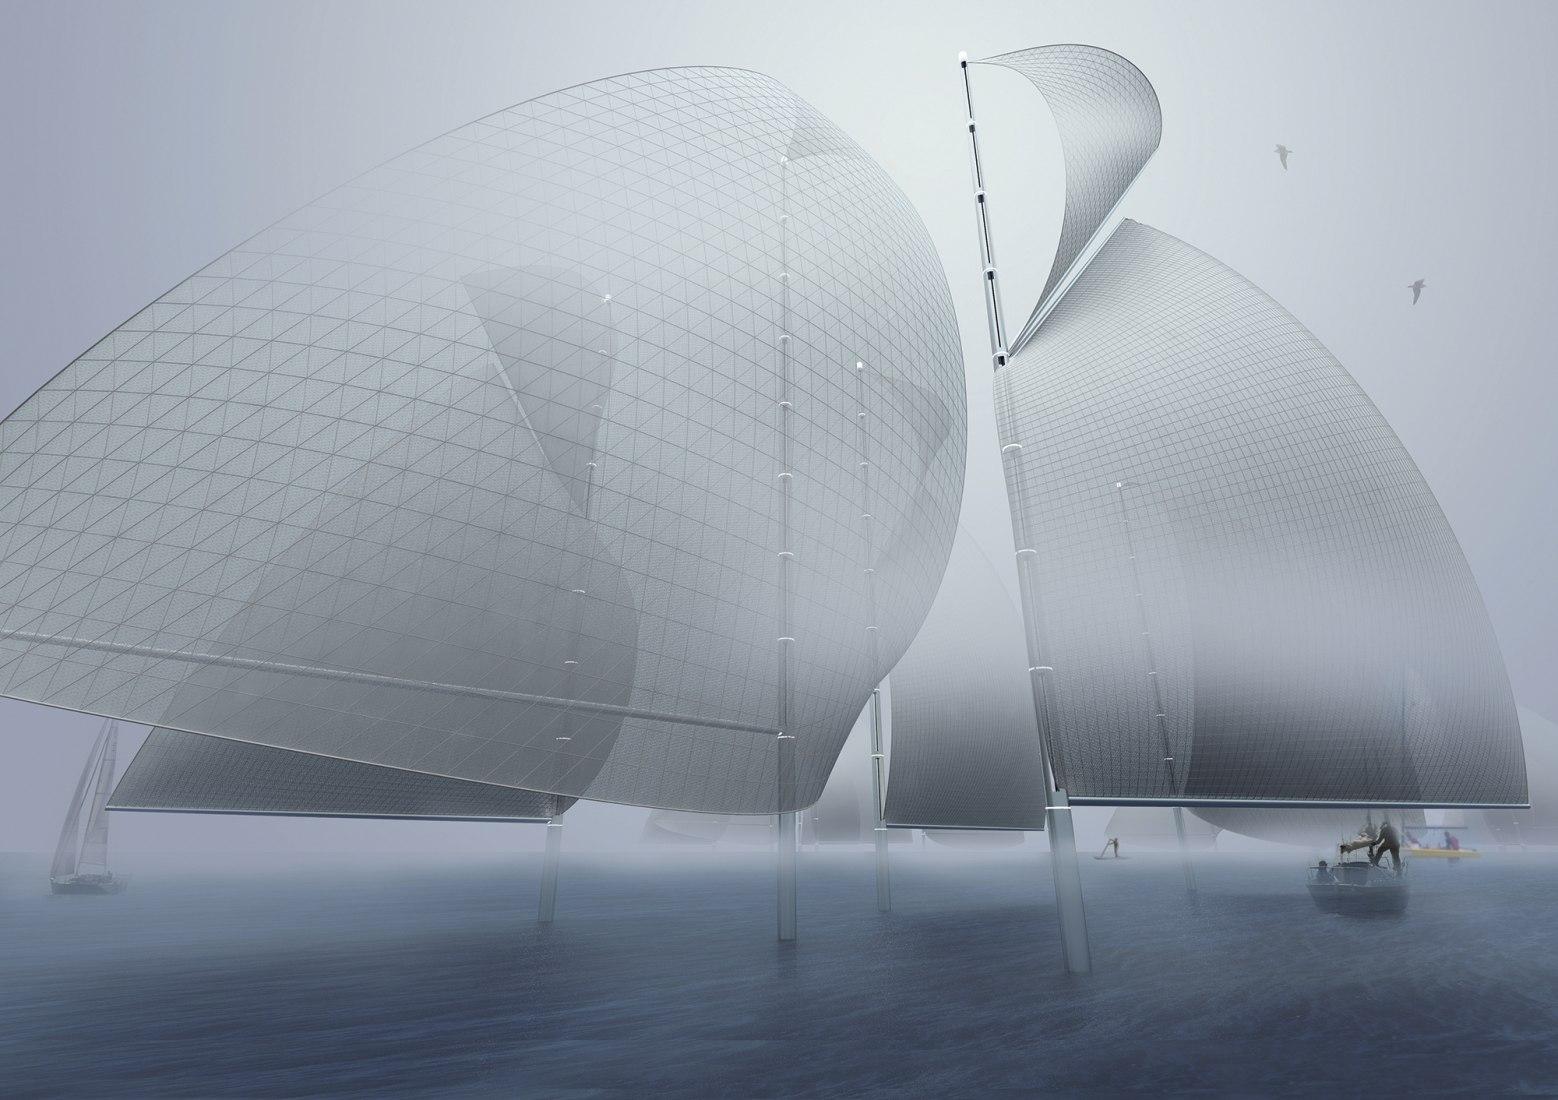 First Prize. Regatta H2O: Familiar Form, Chameleon Infrastructure. Proposal by Christopher Sjoberg, Ryo Saito